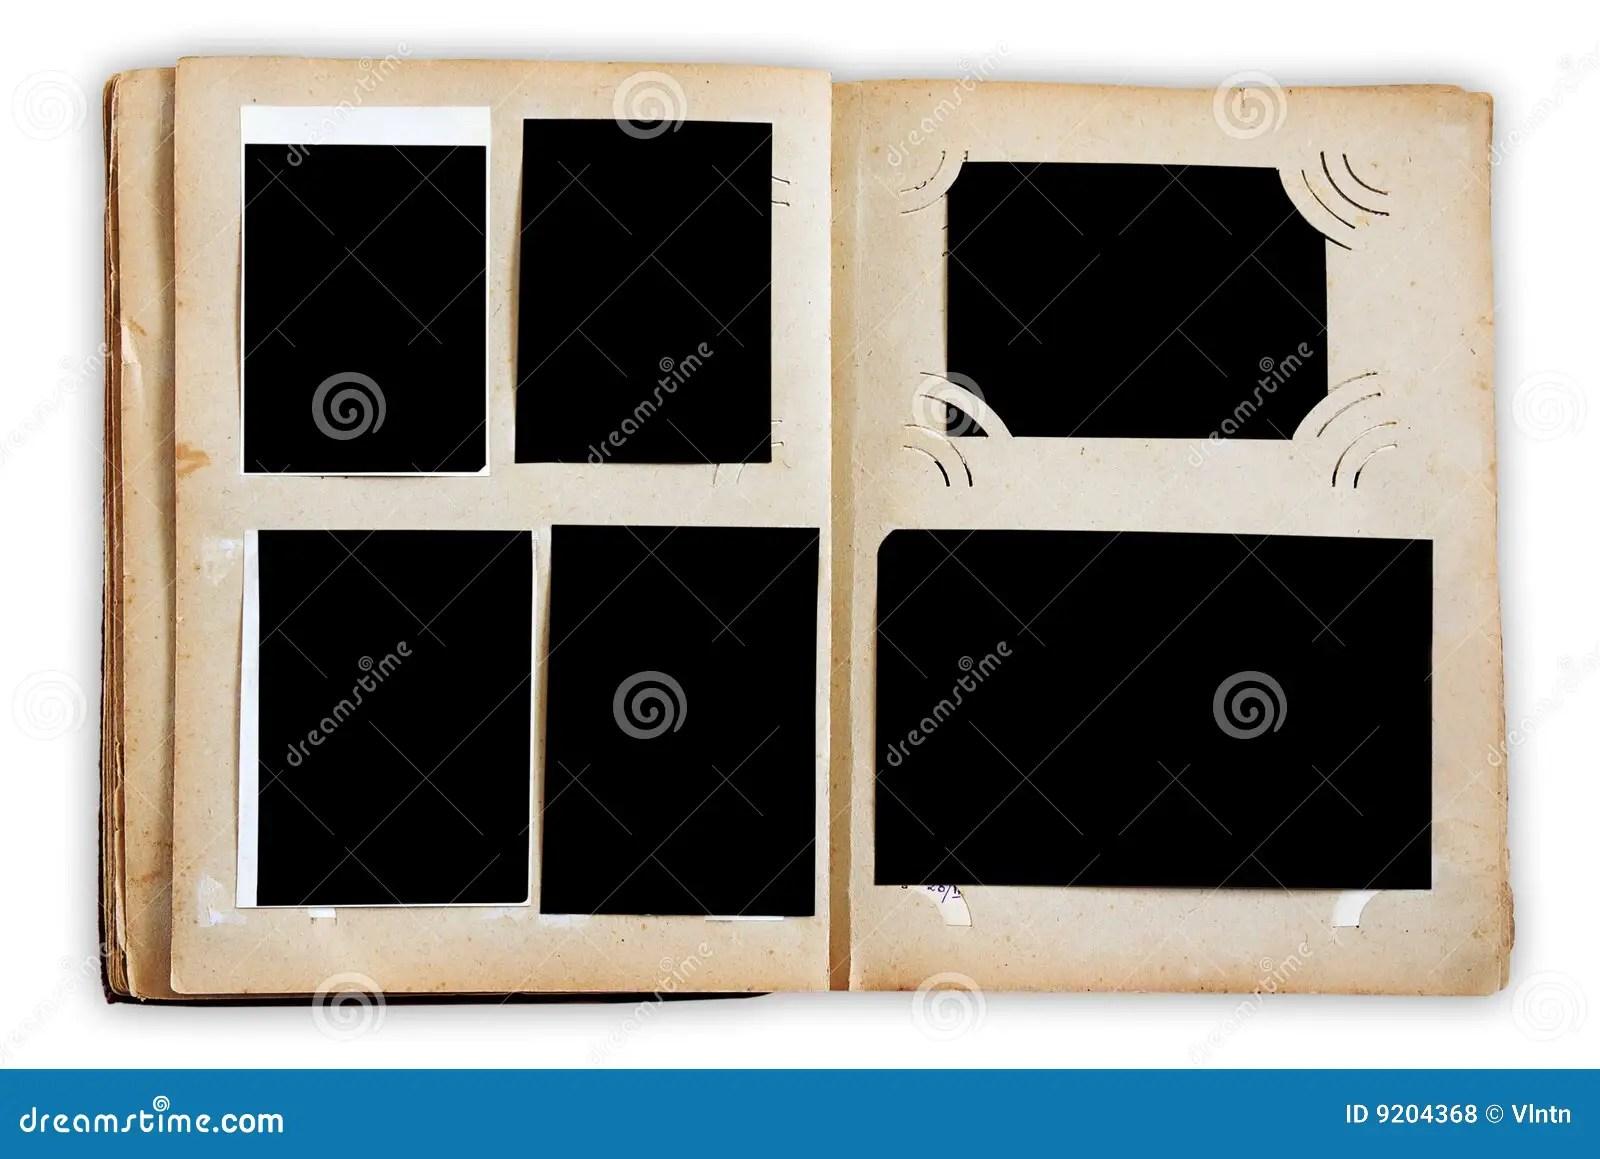 Vintage Photo Album Pages Stock Photo. Image Of Rough